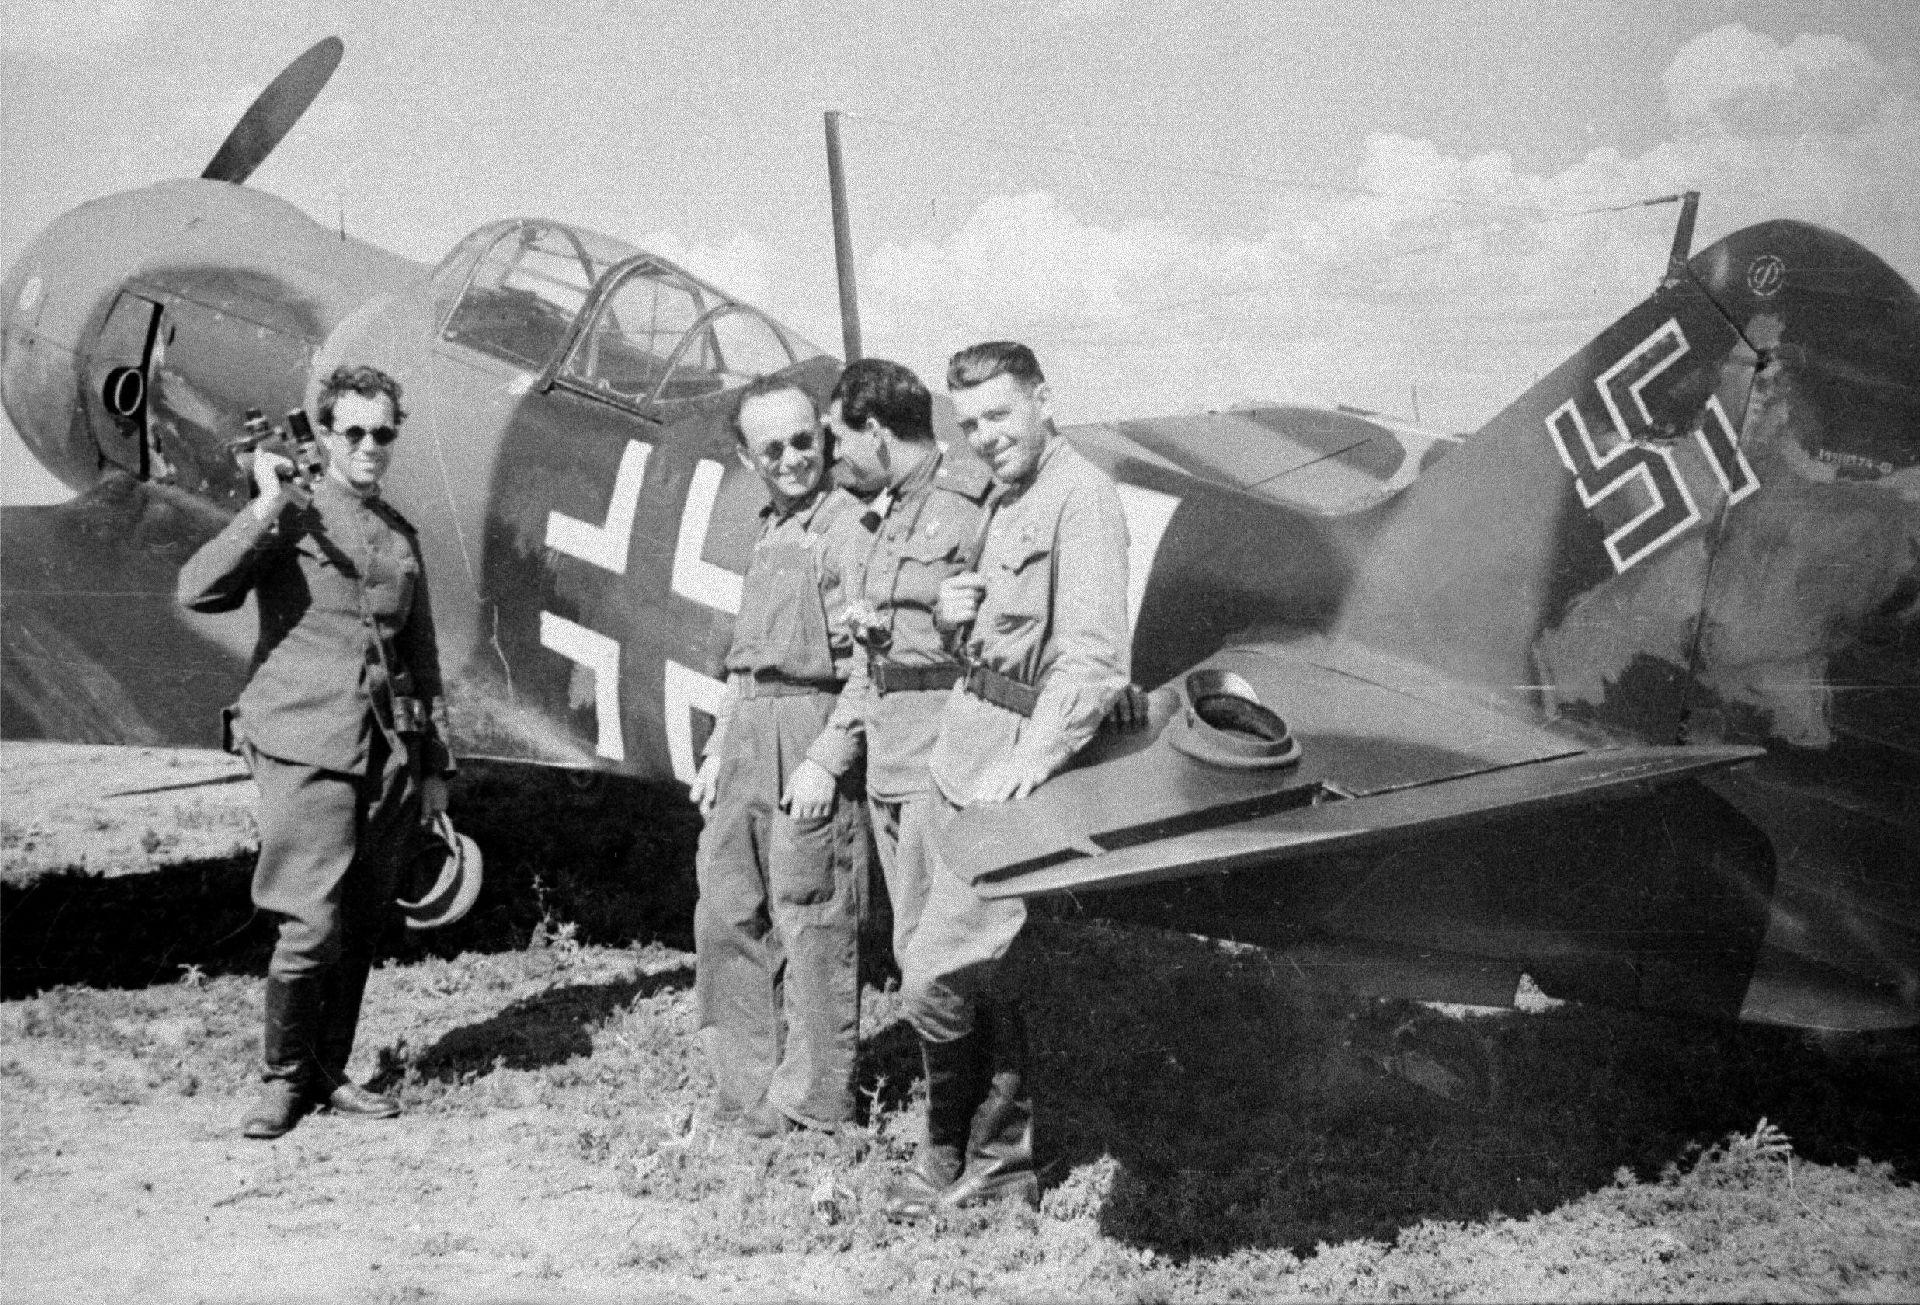 Экспонат #110. На аэродроме под Армавиром. Ла5-ф. 1943 год